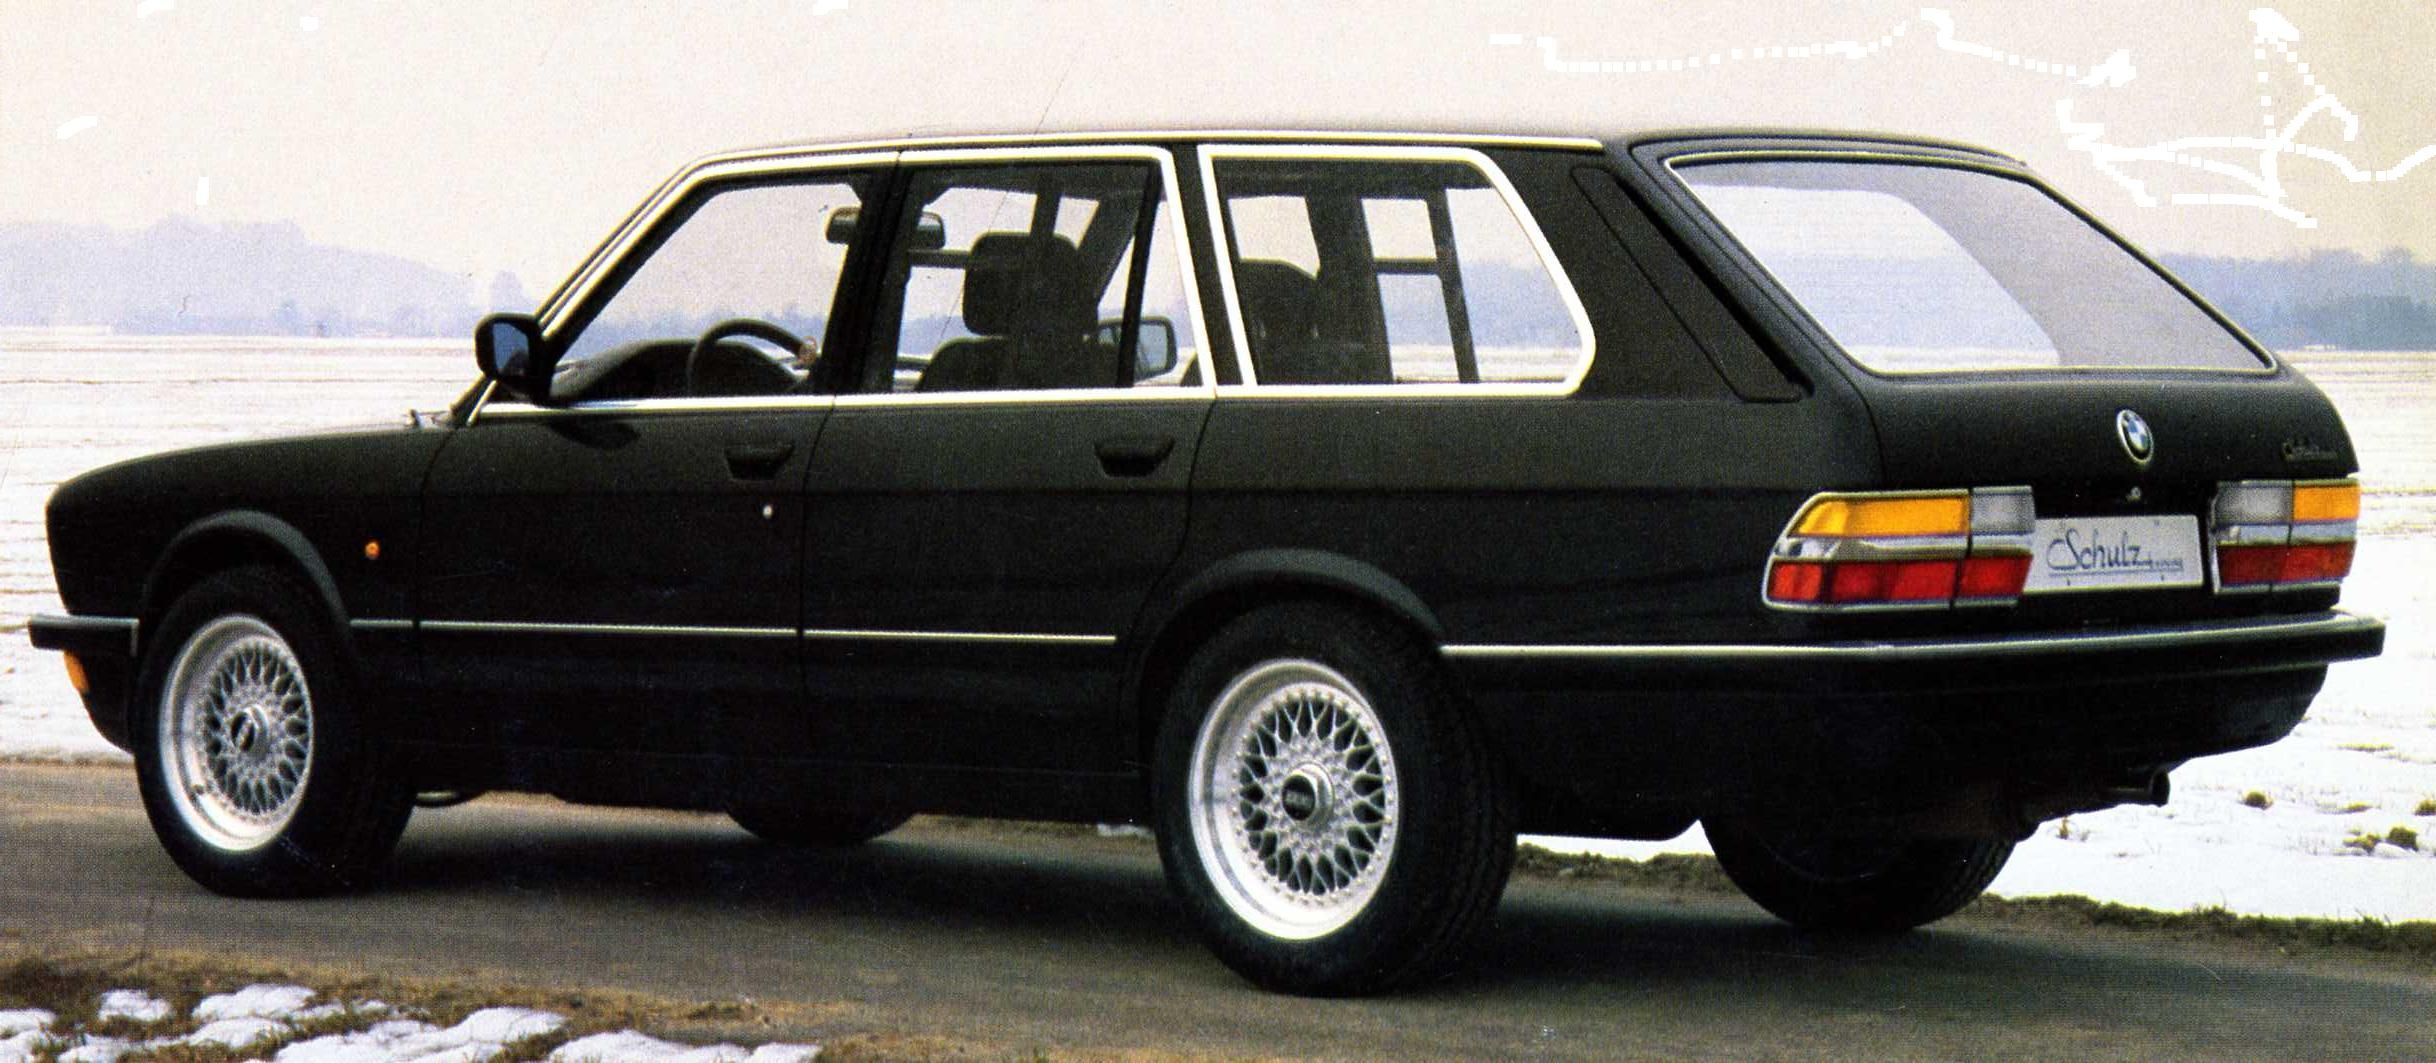 OG BMW 5 series Touring Type E28 Designed and built